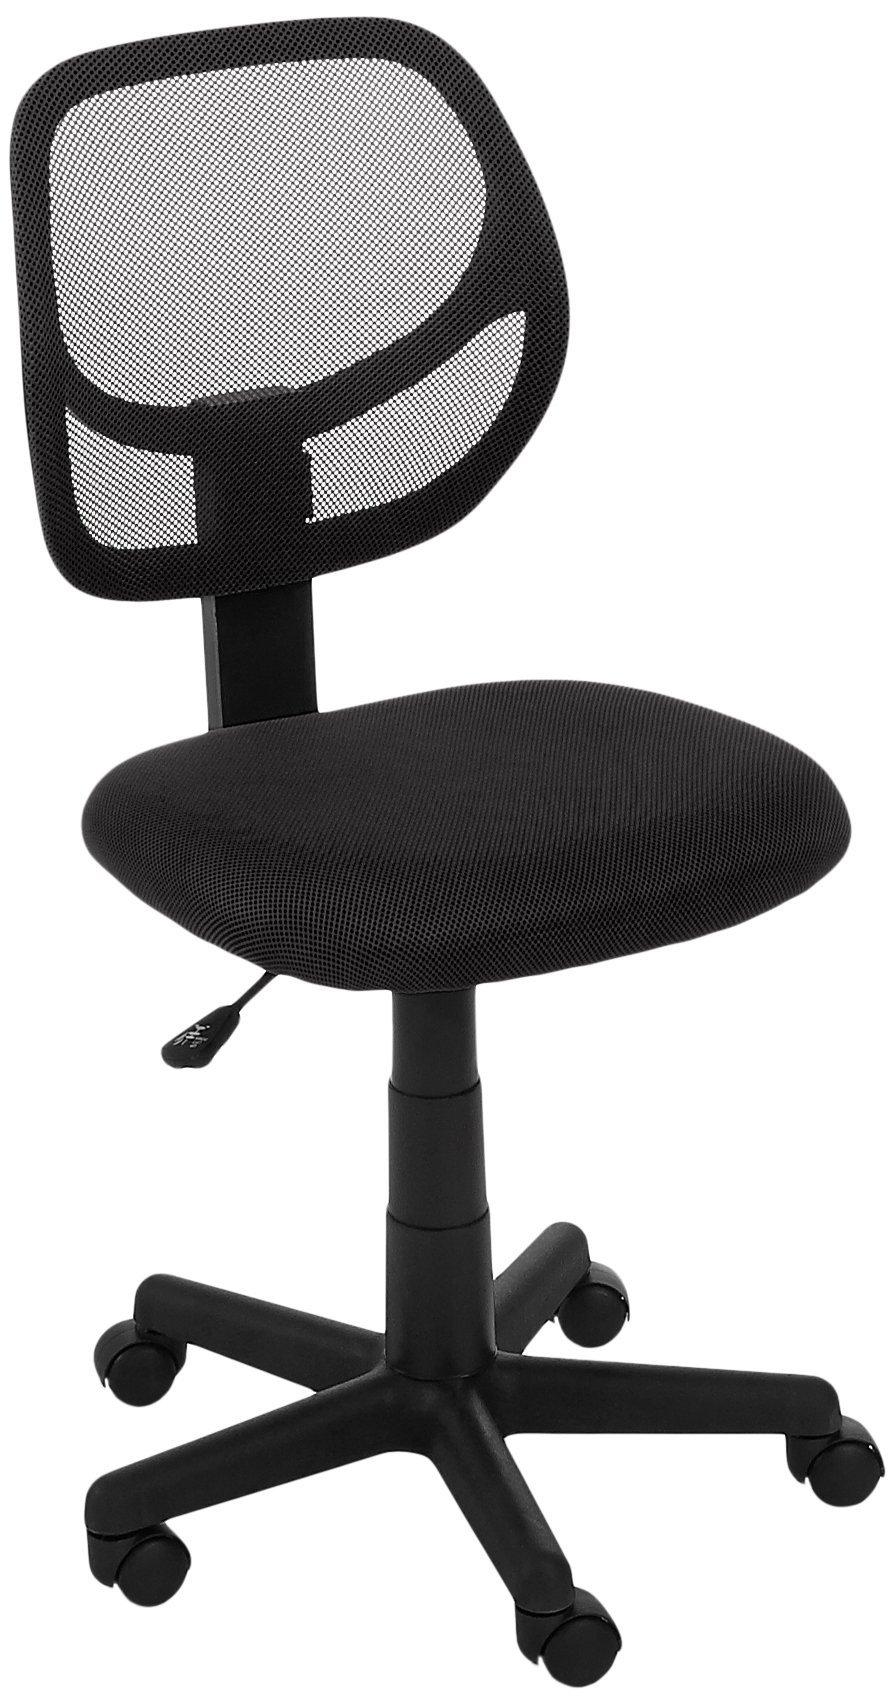 Amazonbasics Low-Back Computer Chair - Black 14